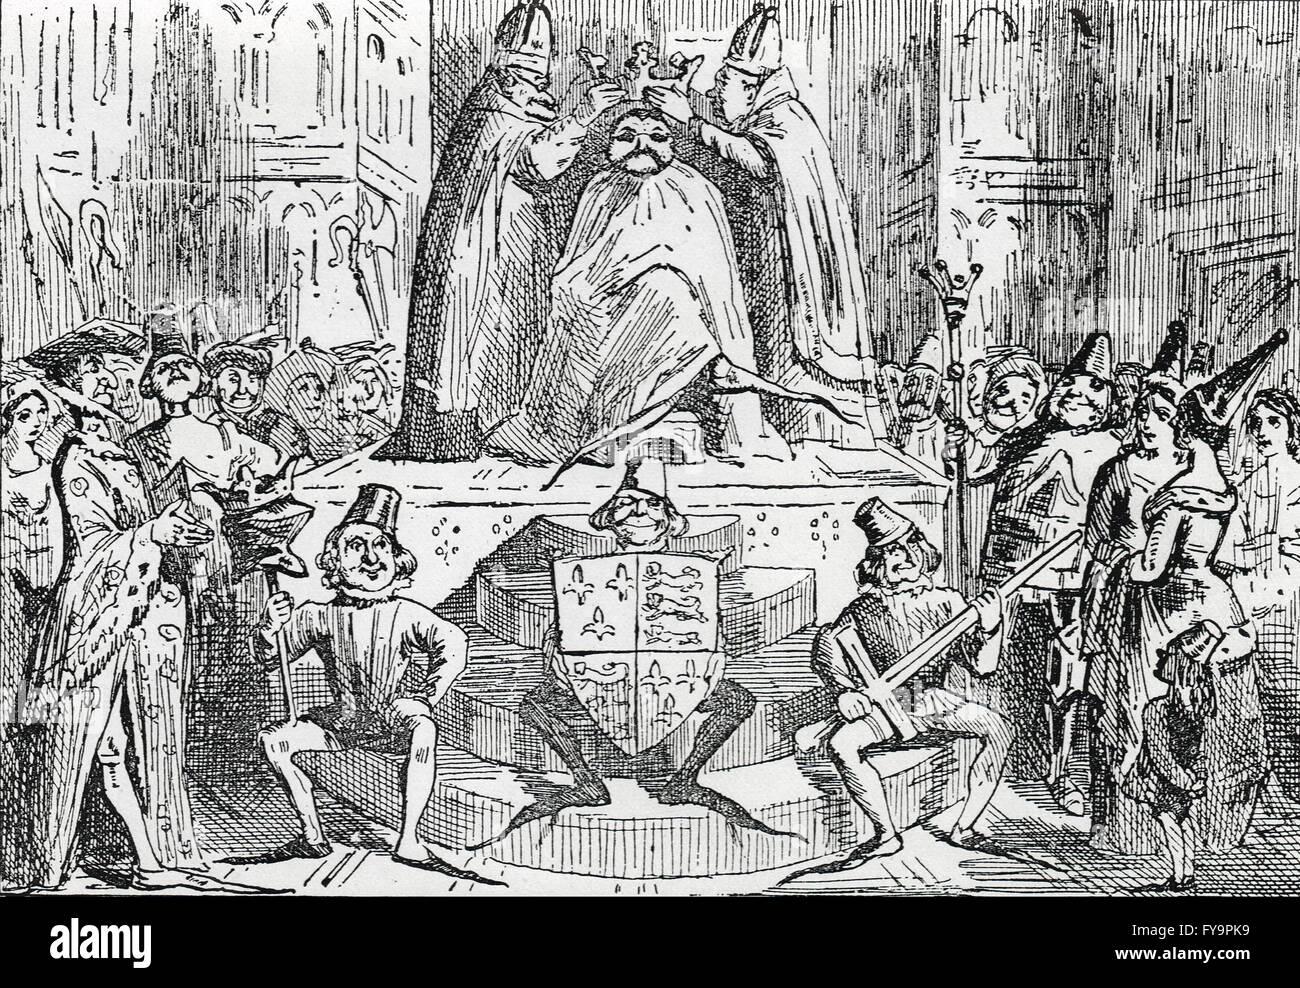 Coronation of Henry IV by John Leech - Stock Image